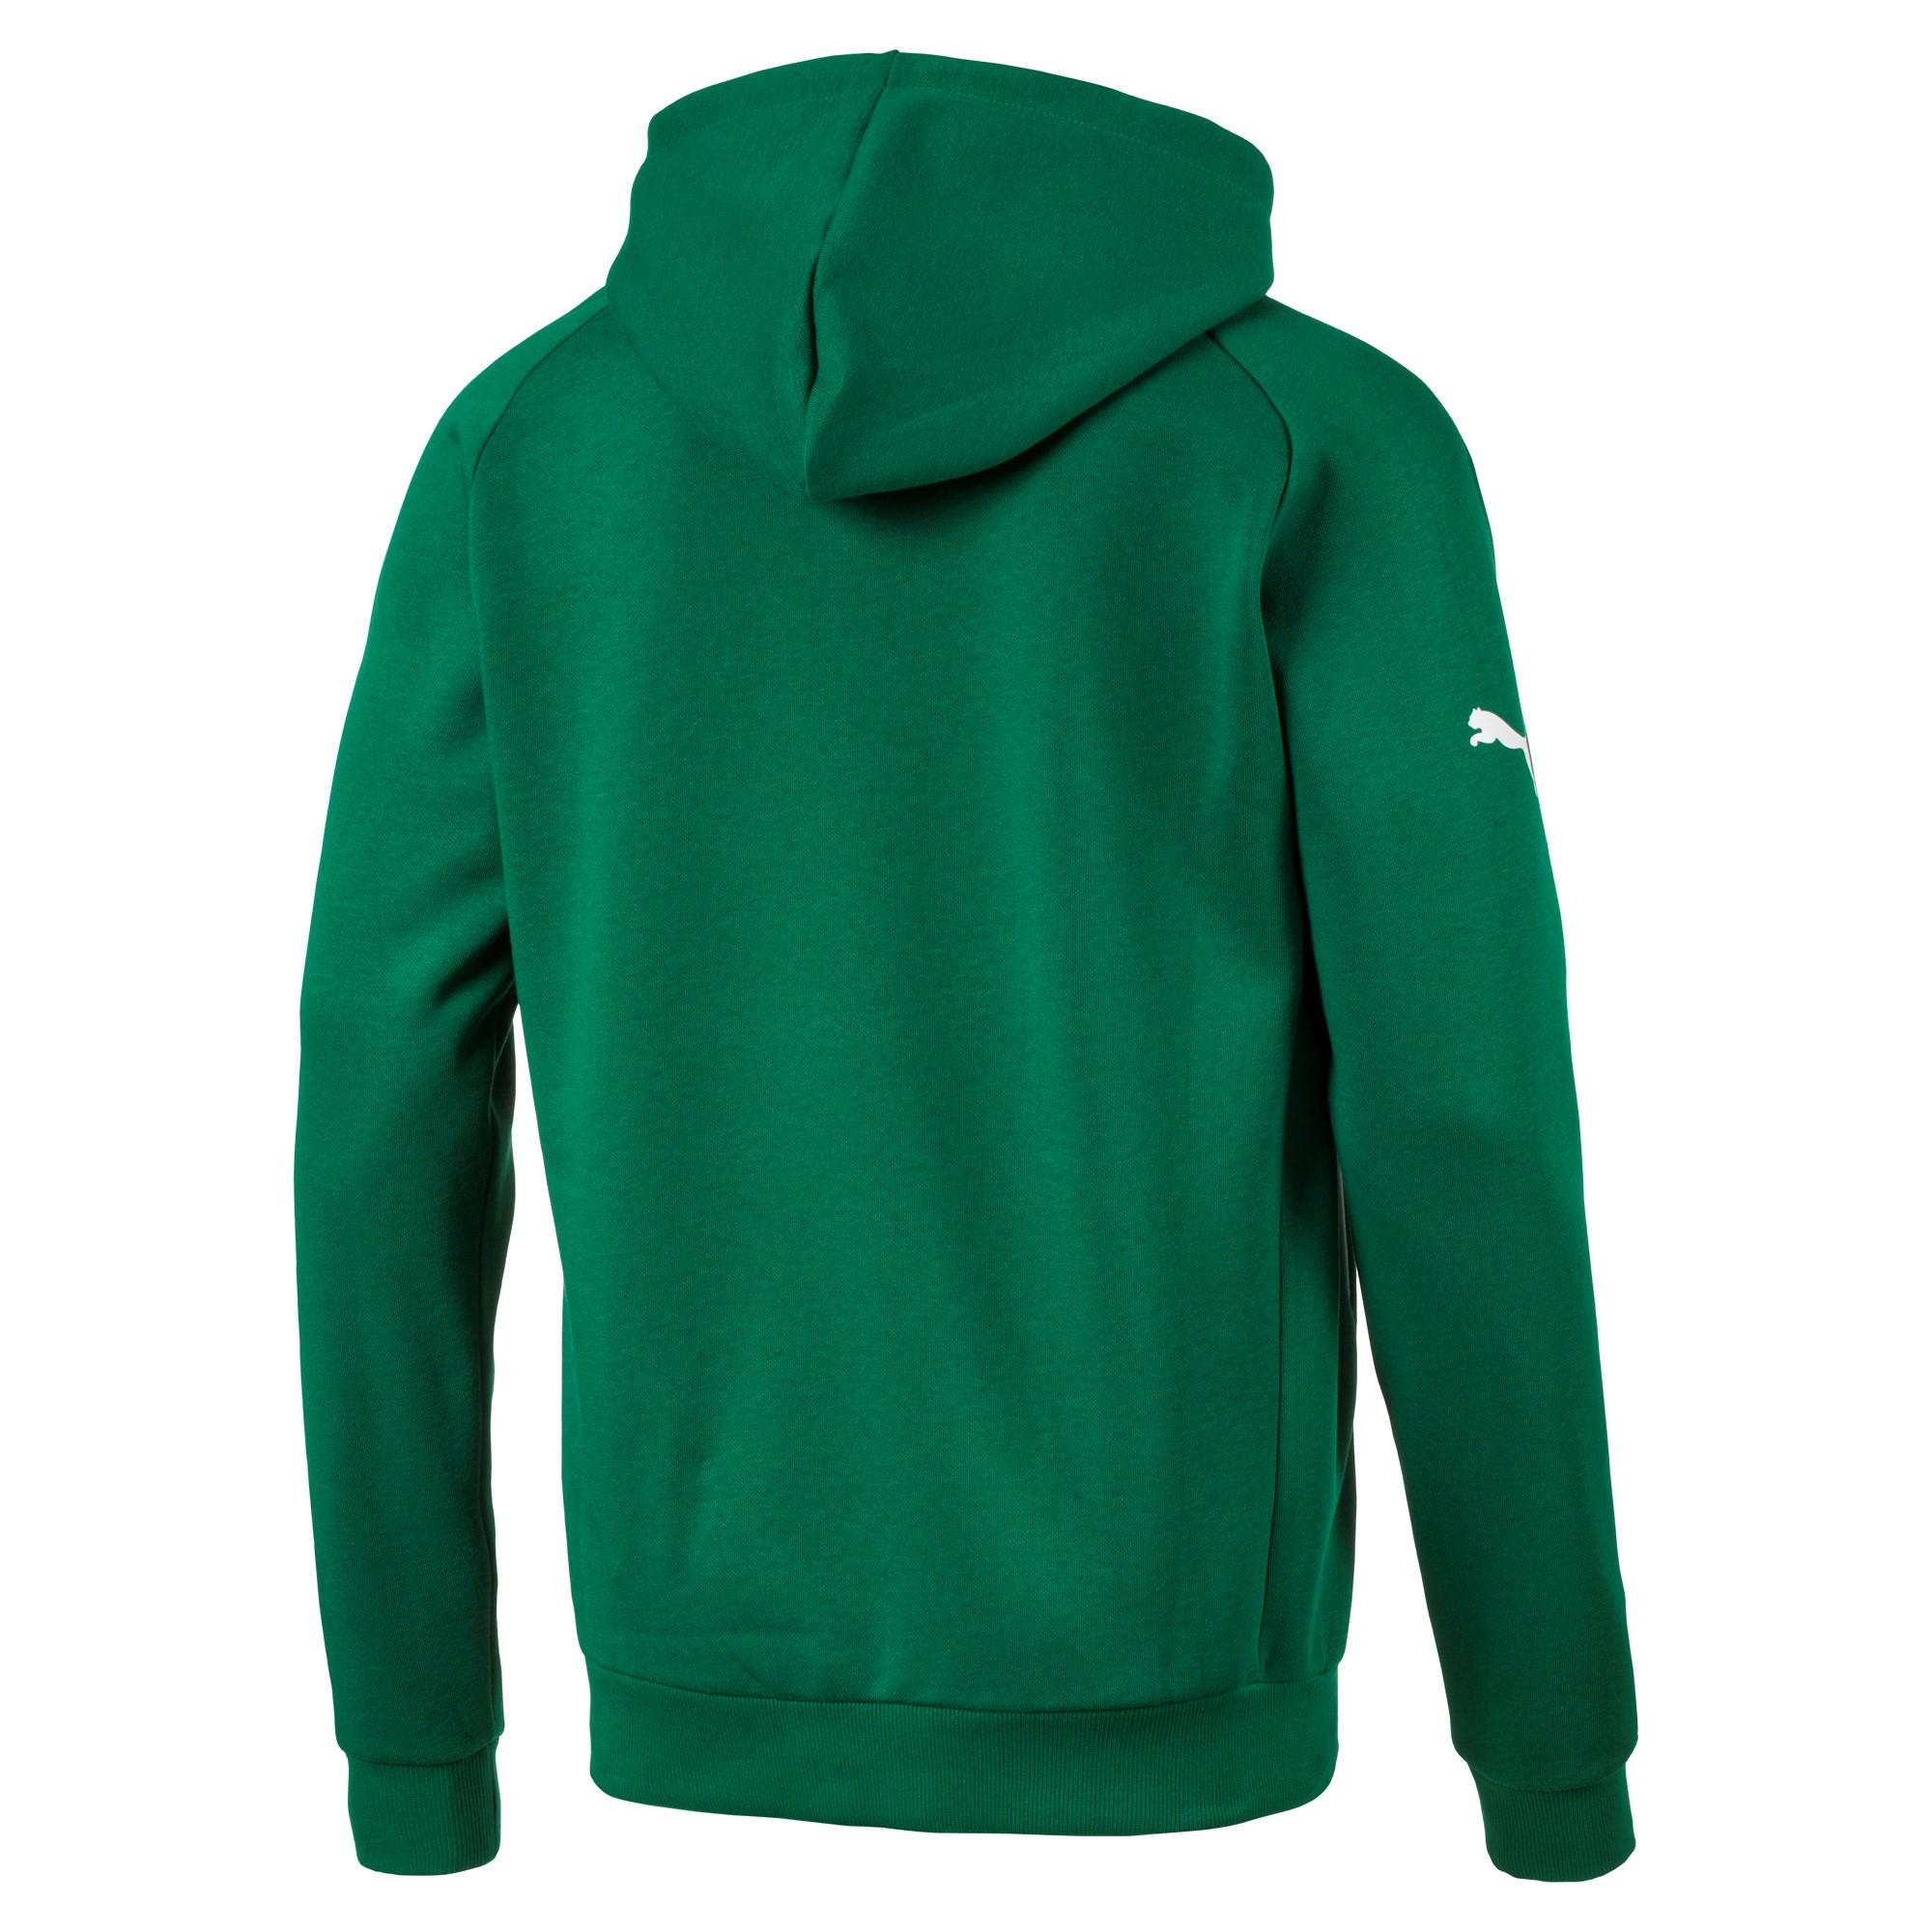 Puma Hoody Herren Kapuzen Pullover 653979 05 grün